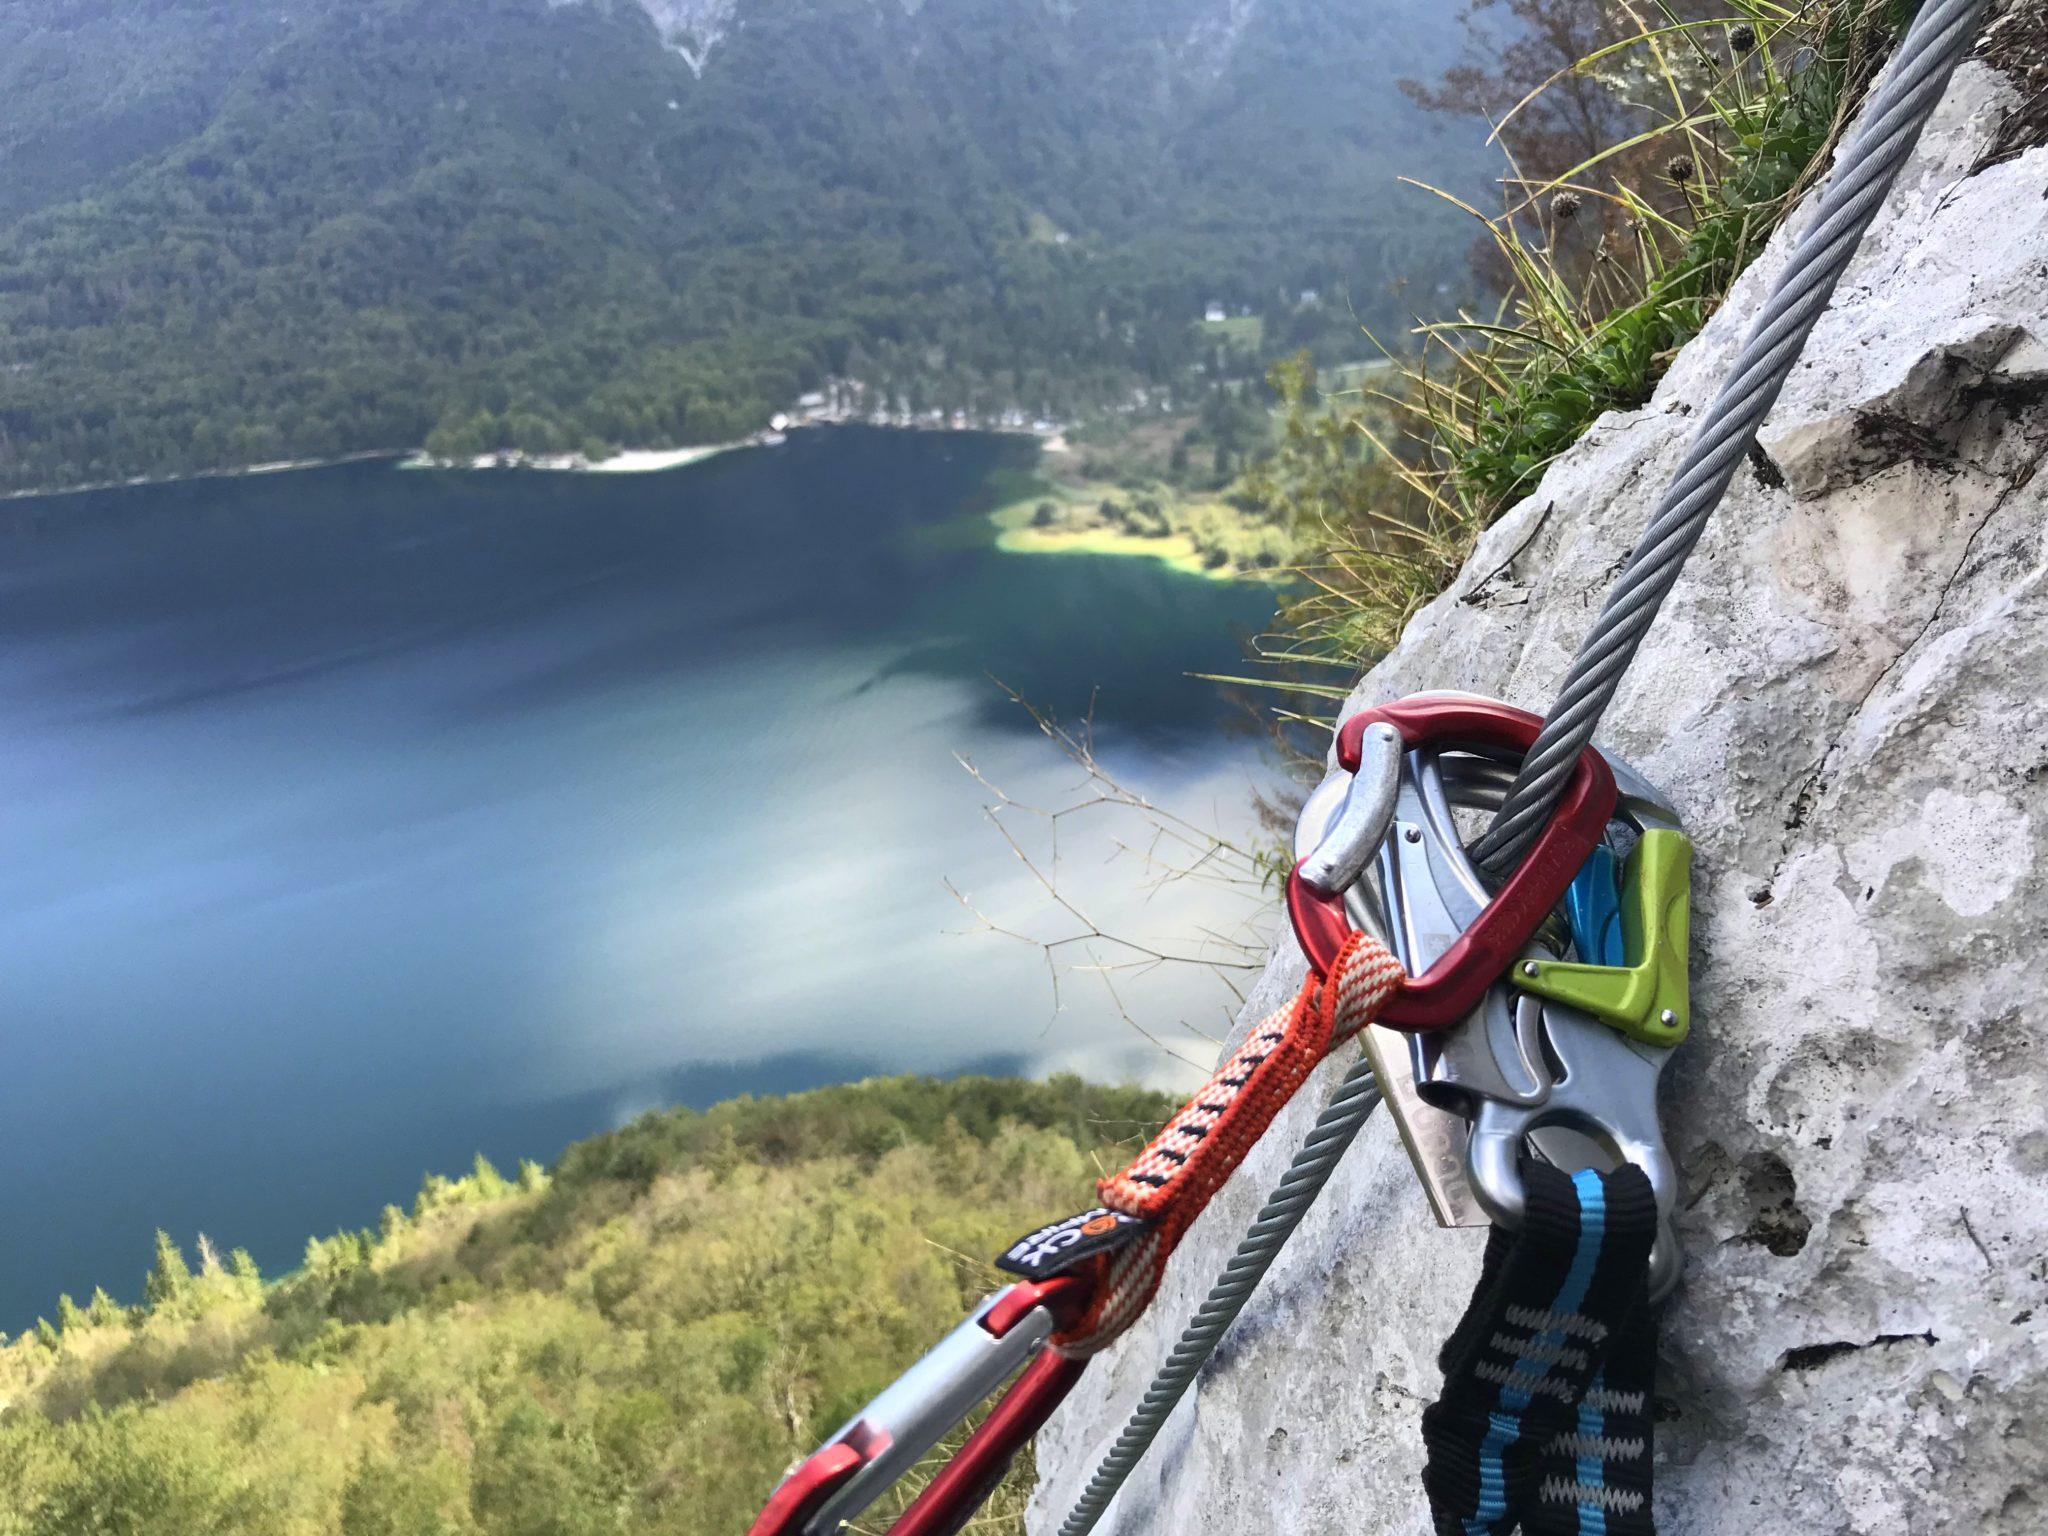 Climbing gear for a via ferrata